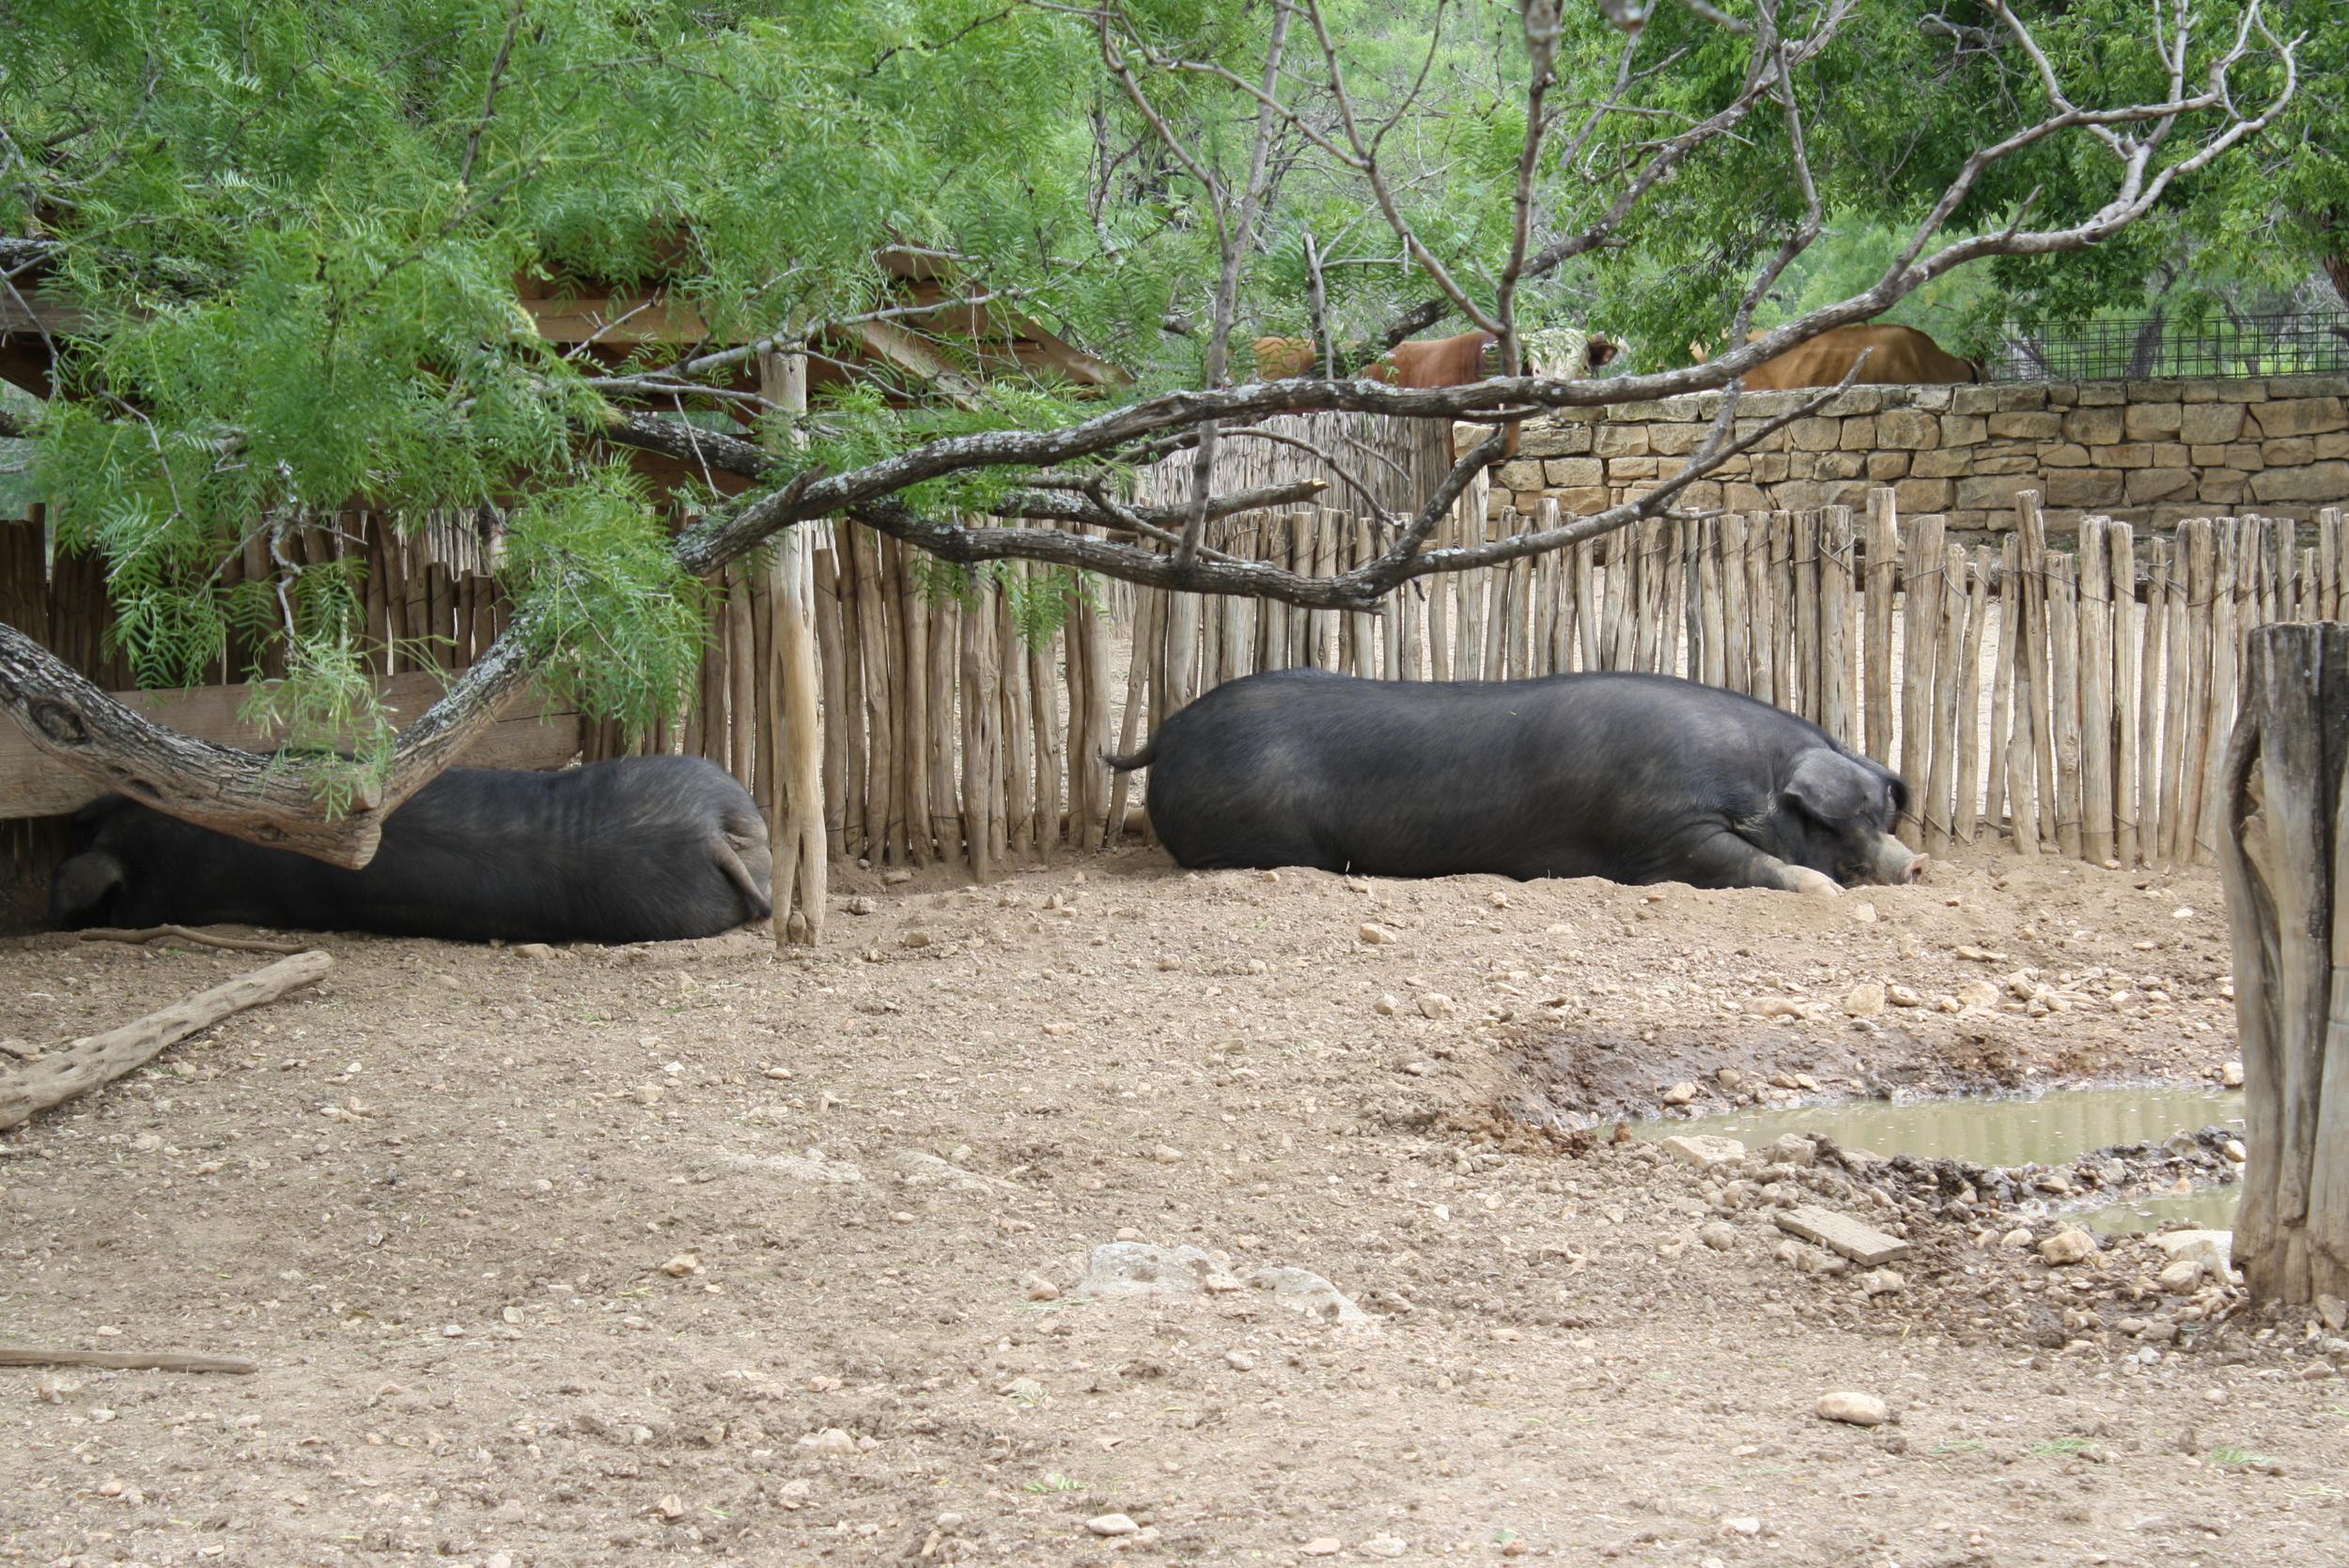 Massive hogs